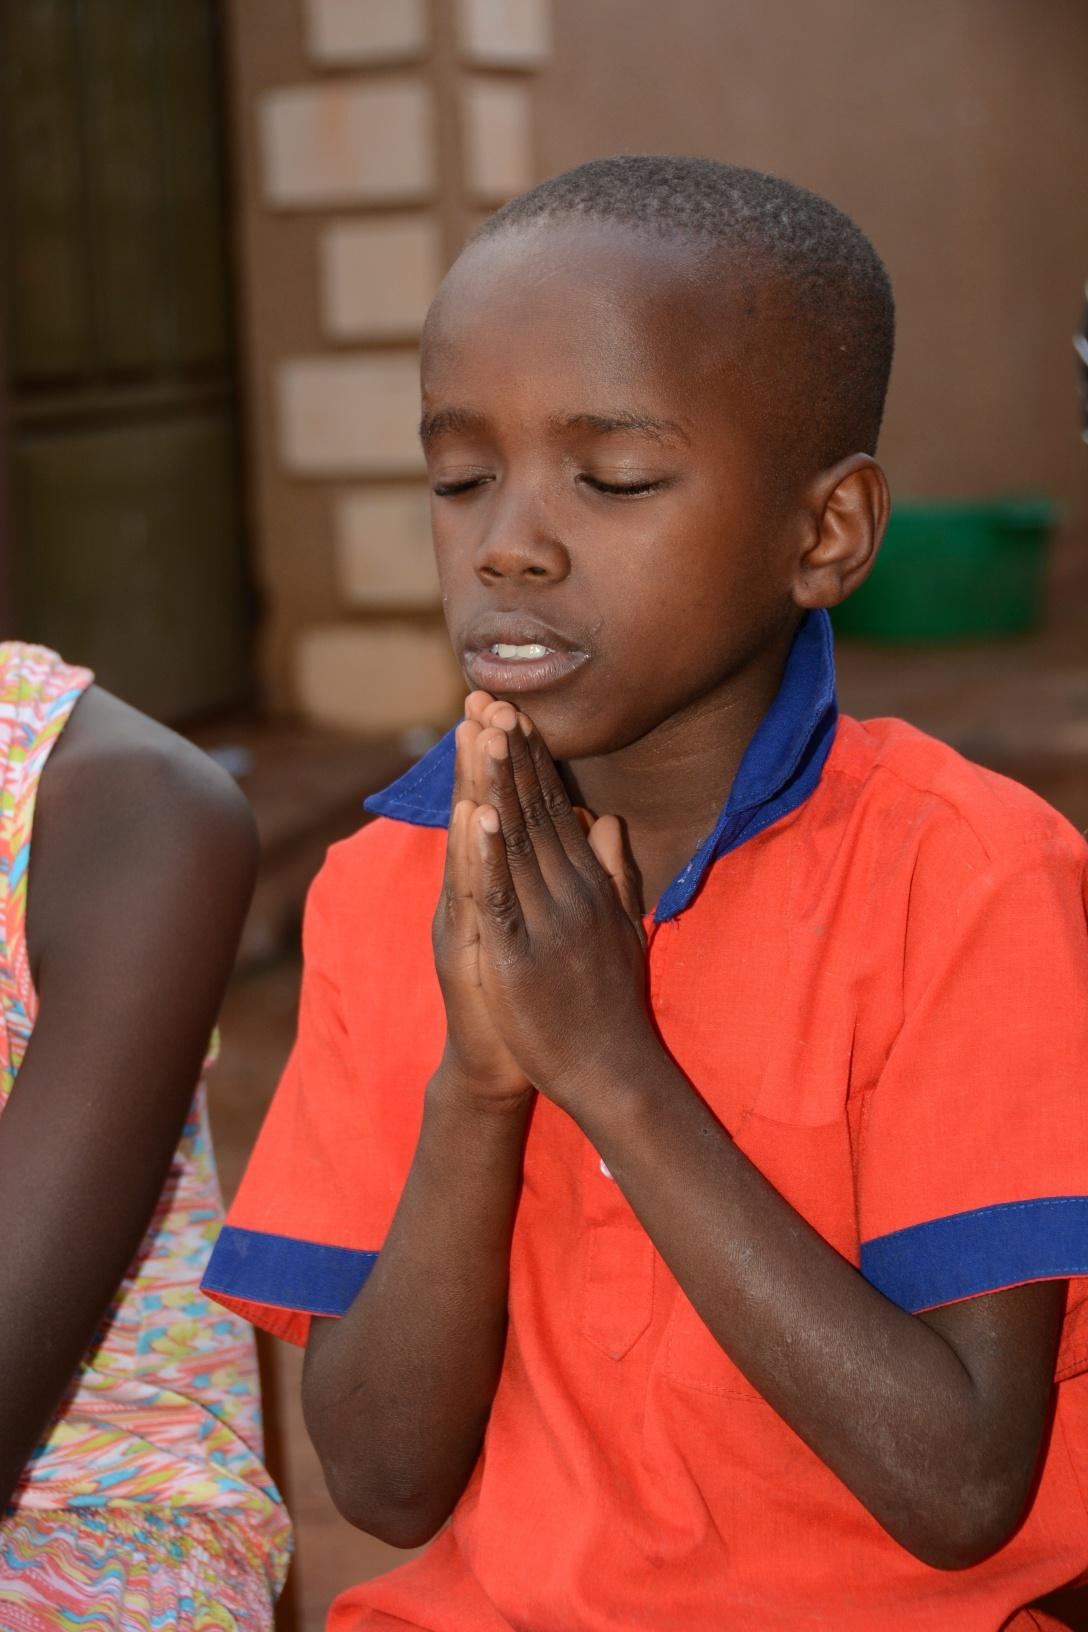 how sweet huh? Desire in prayer.